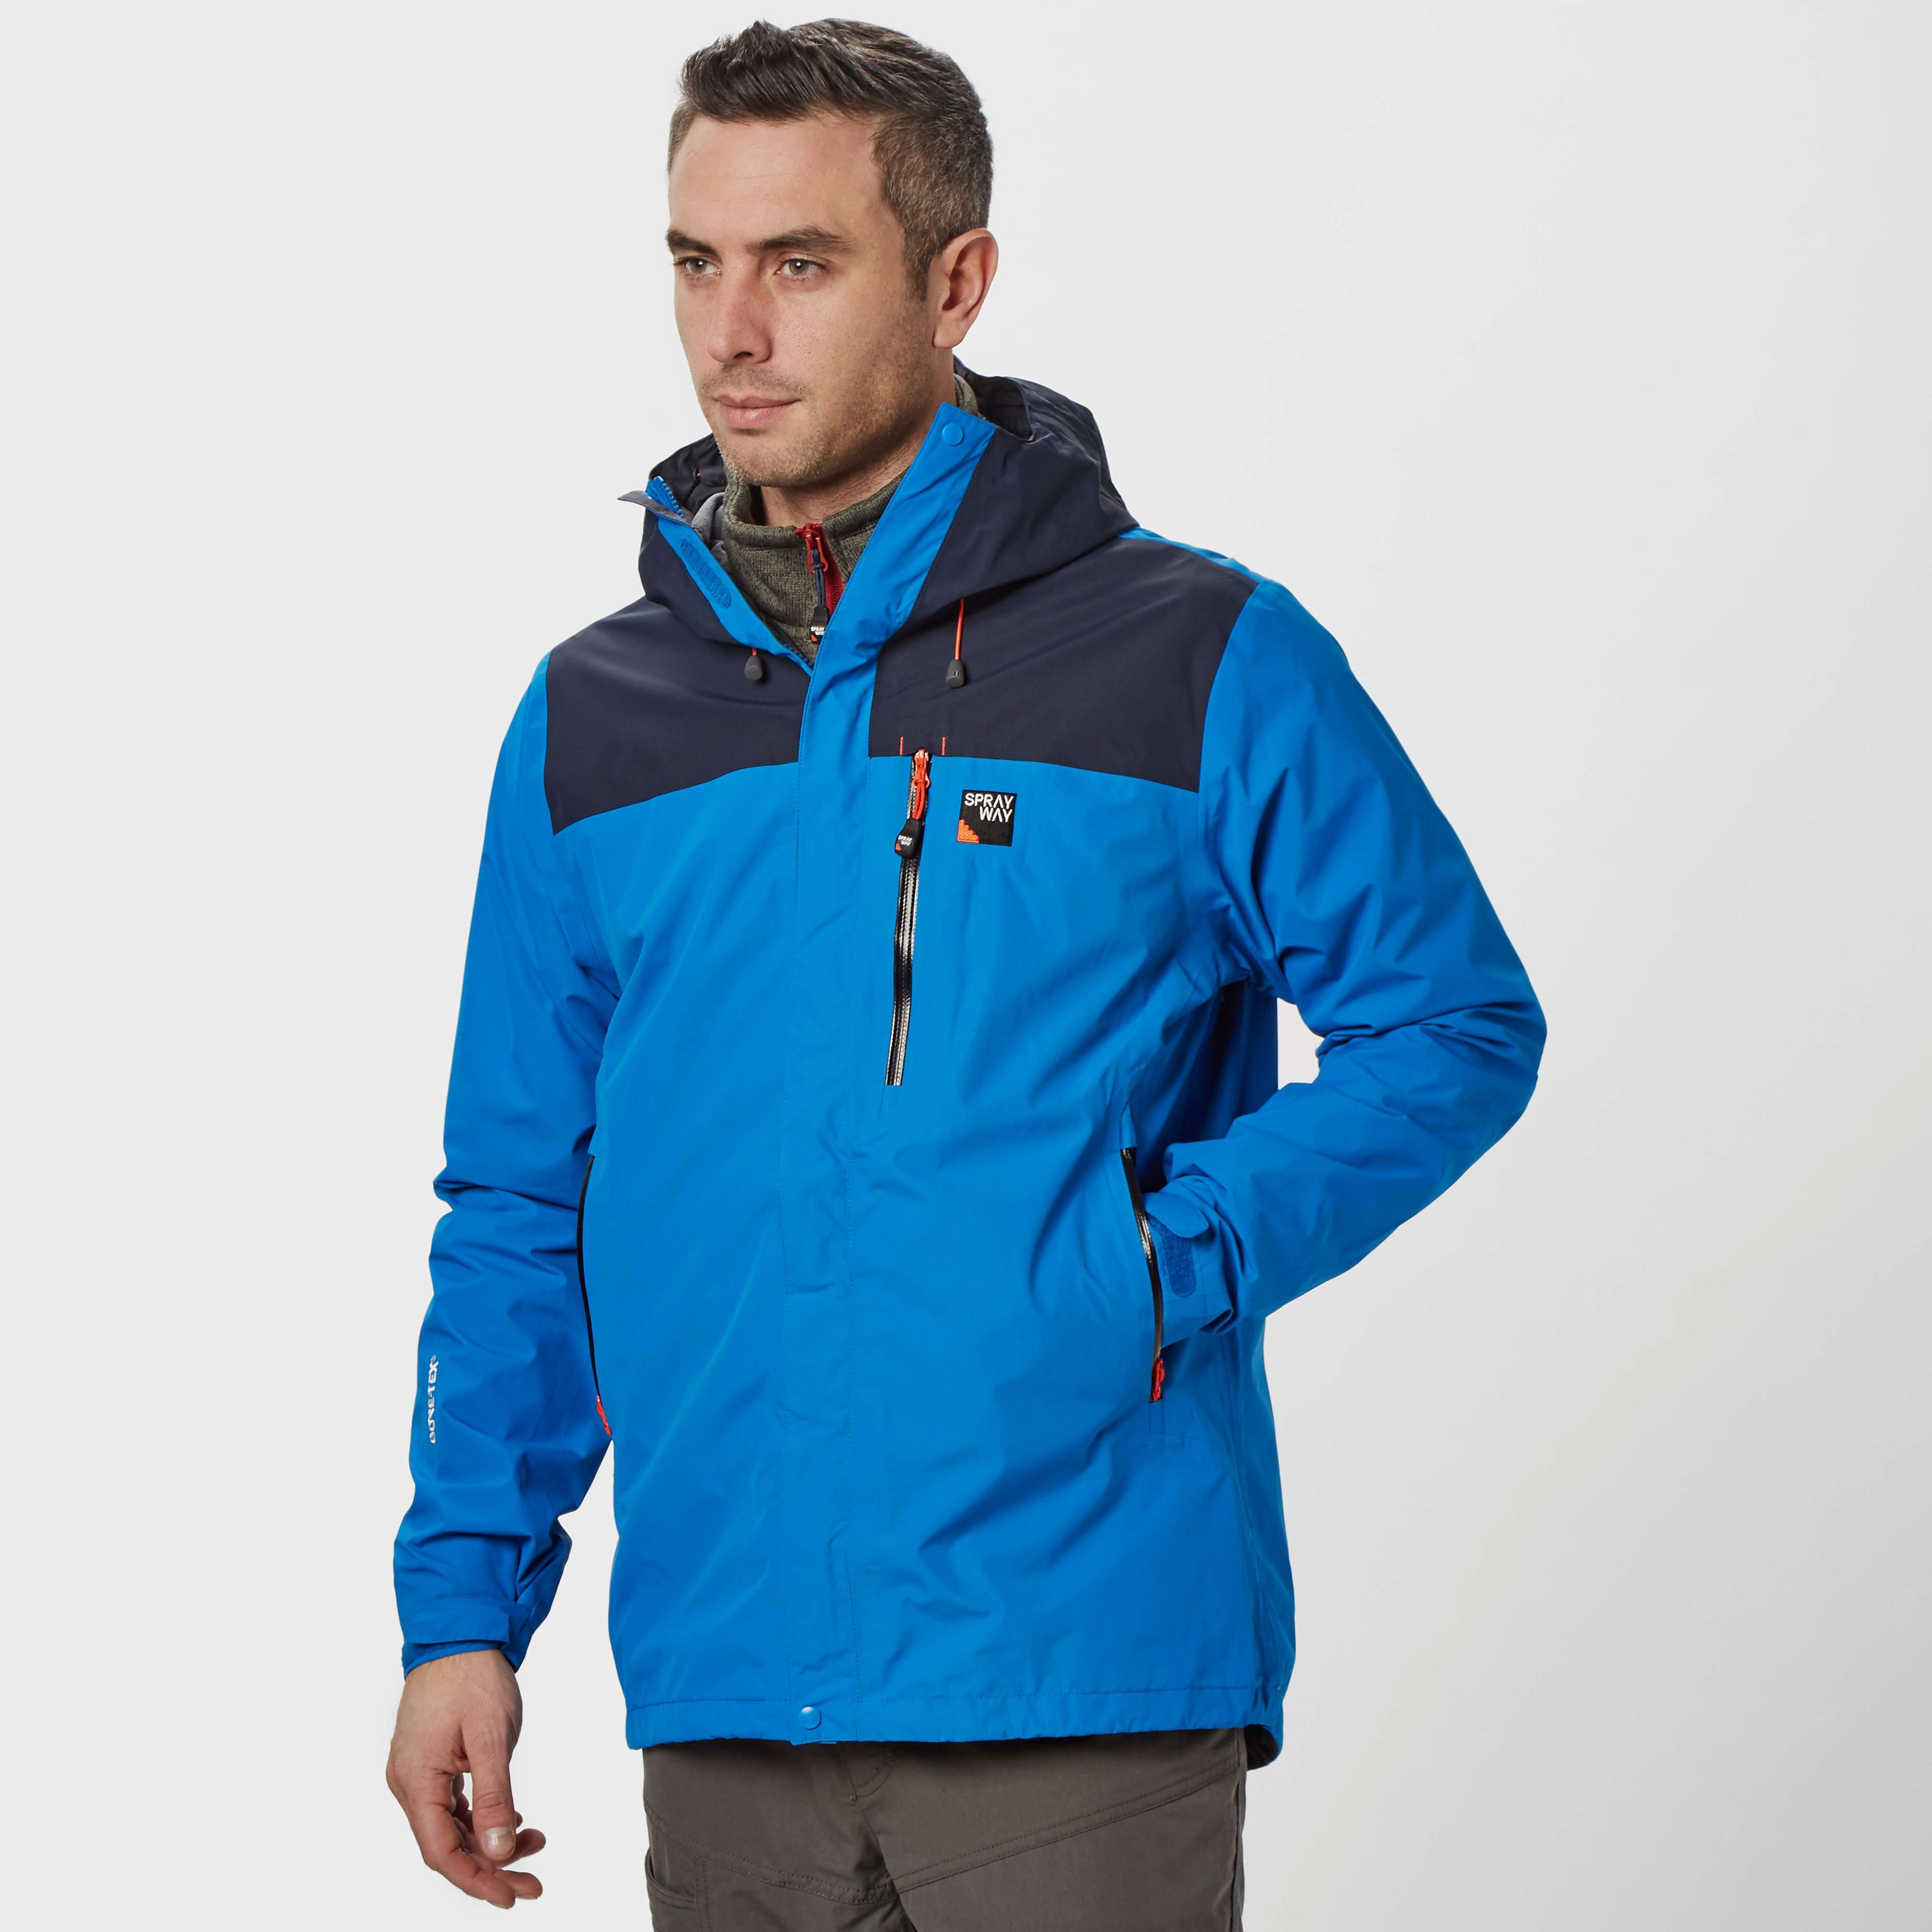 SPRAYWAY Men's Crevasse GORE-TEX® Jacket